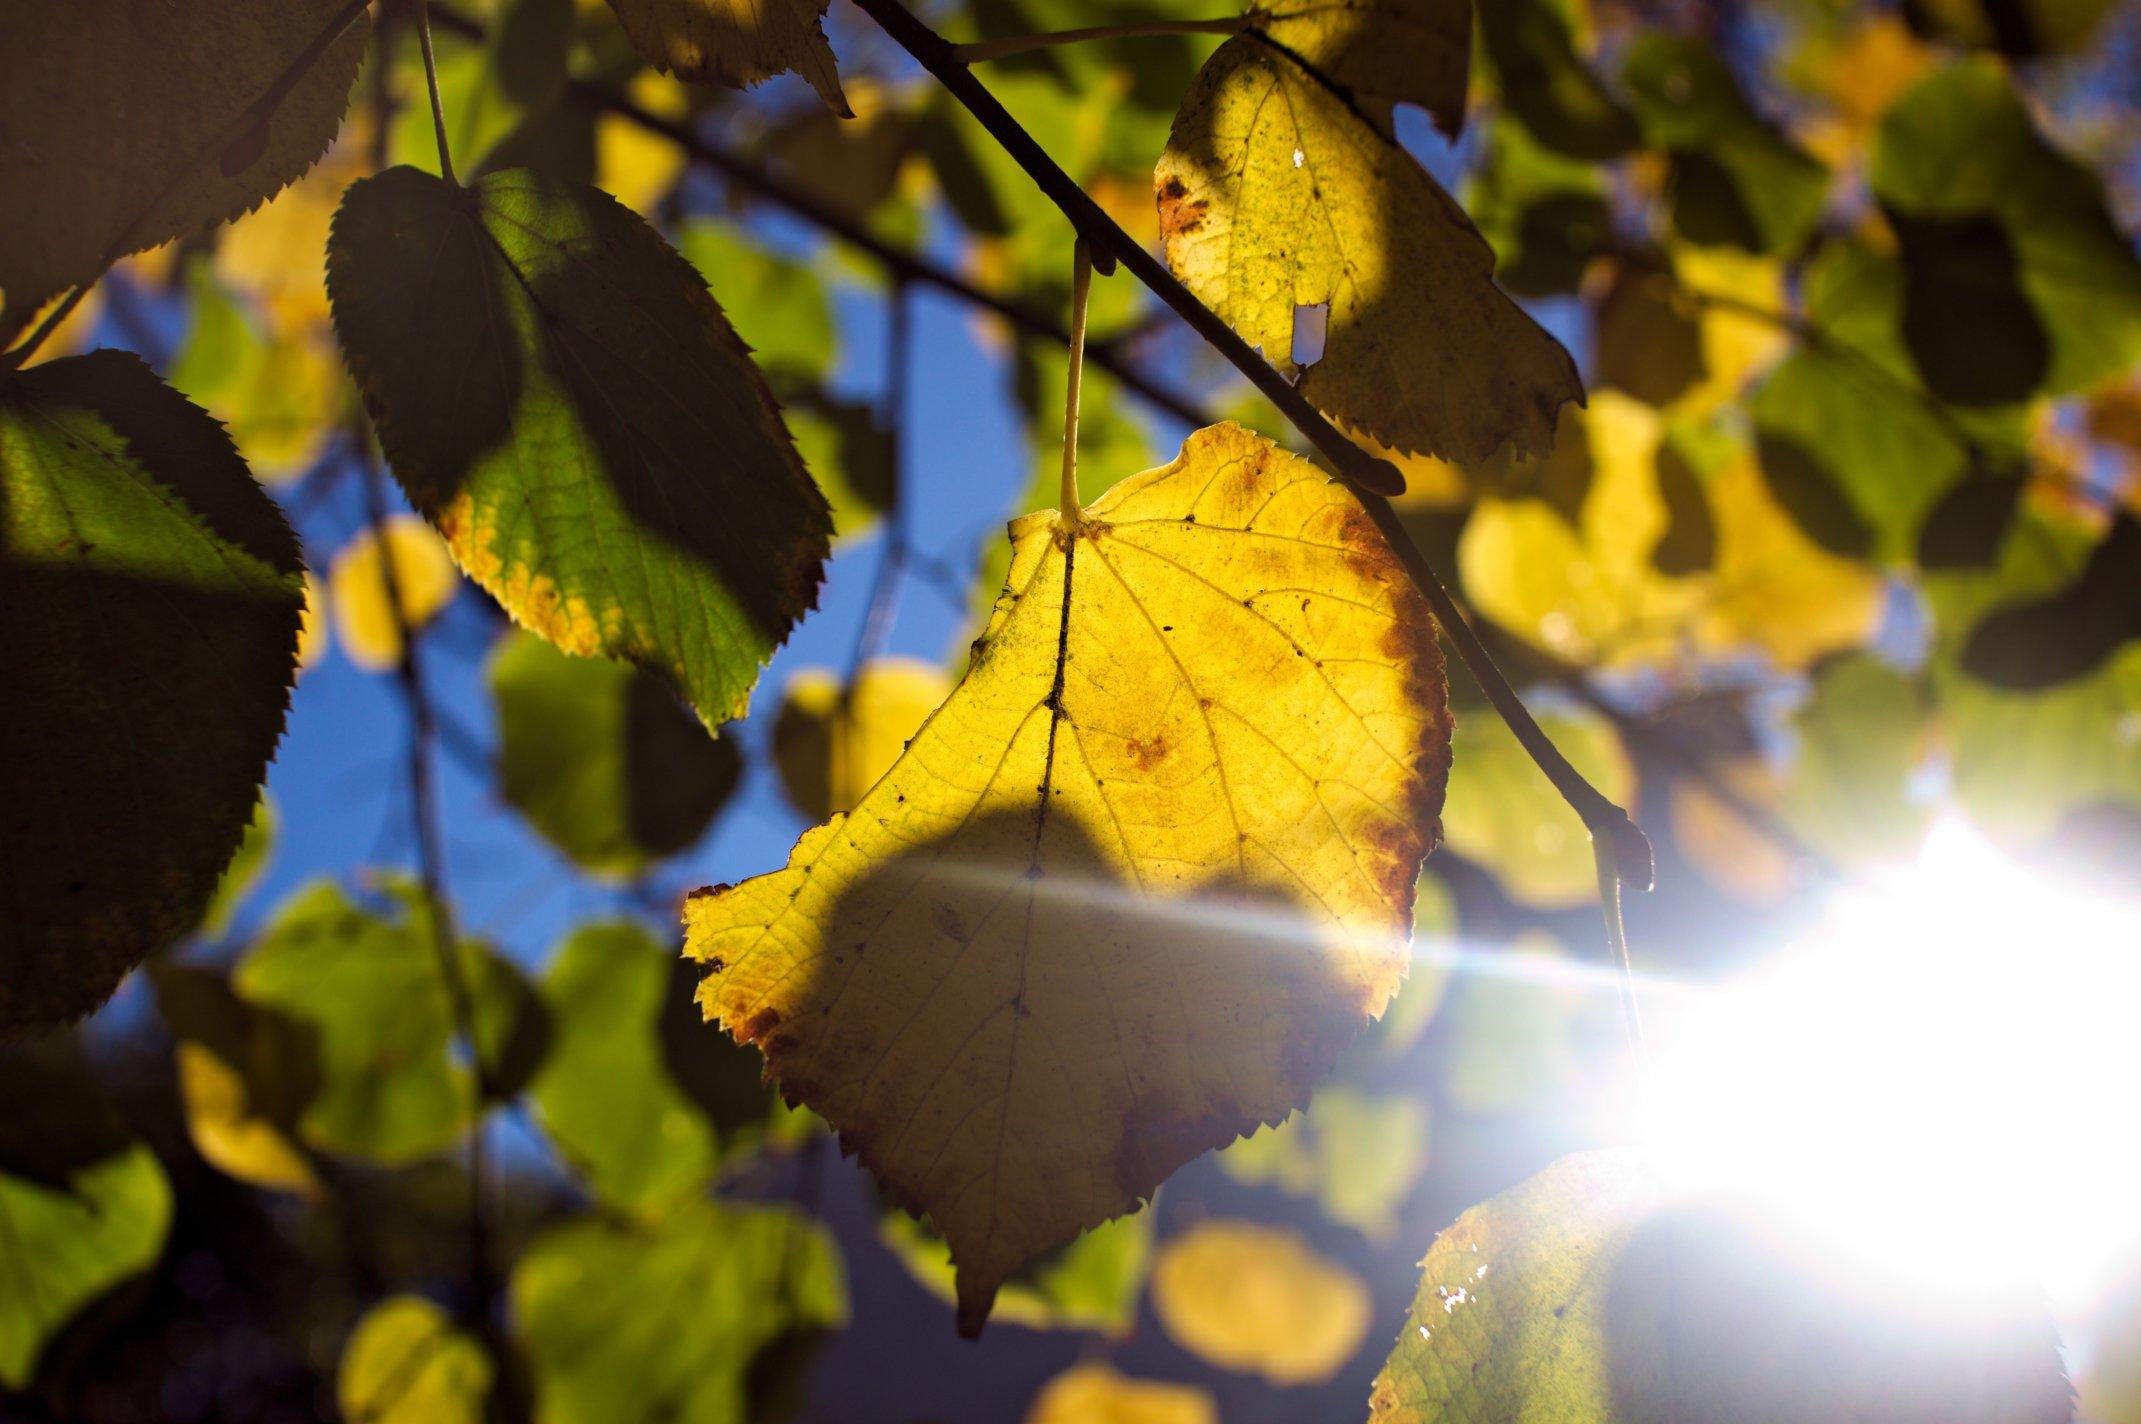 Herbstspaziergang am Schöneberger Ufer – blumes-wiese.cyana.de